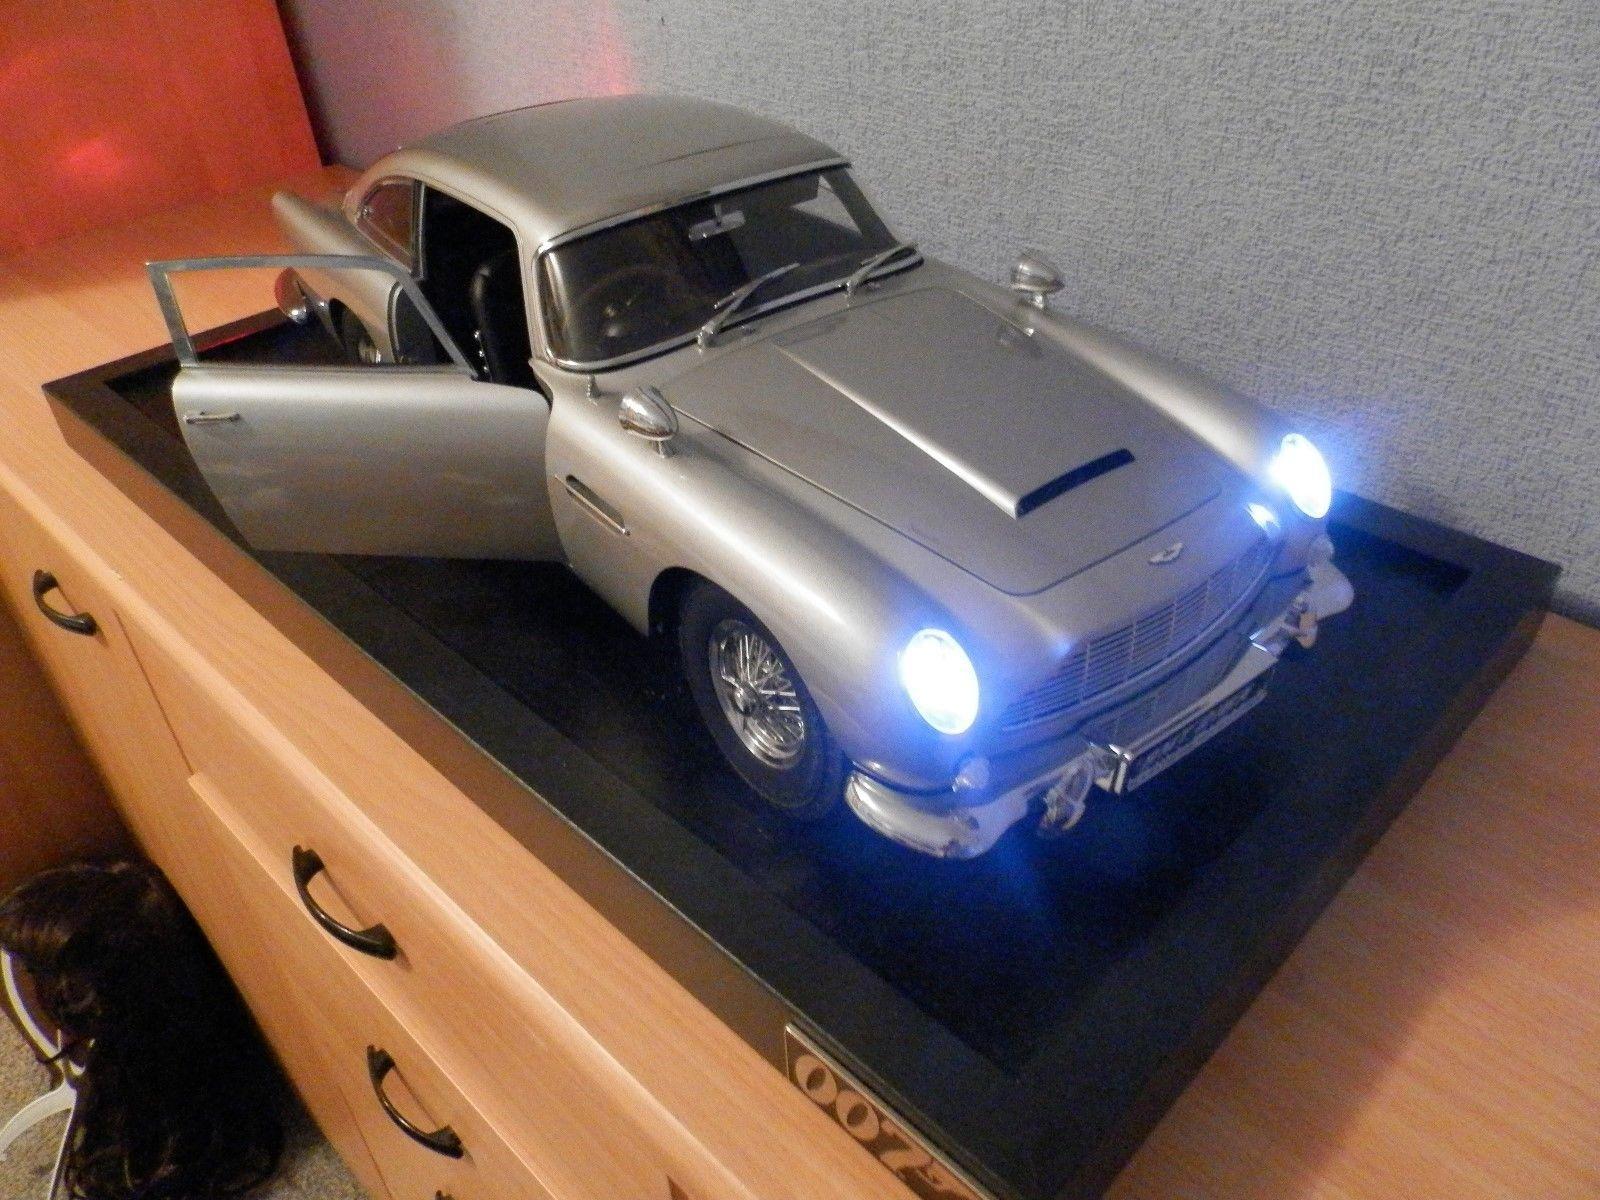 James Bond 007 Db5 Aston Martin Scale 1 8 Classic Model Car